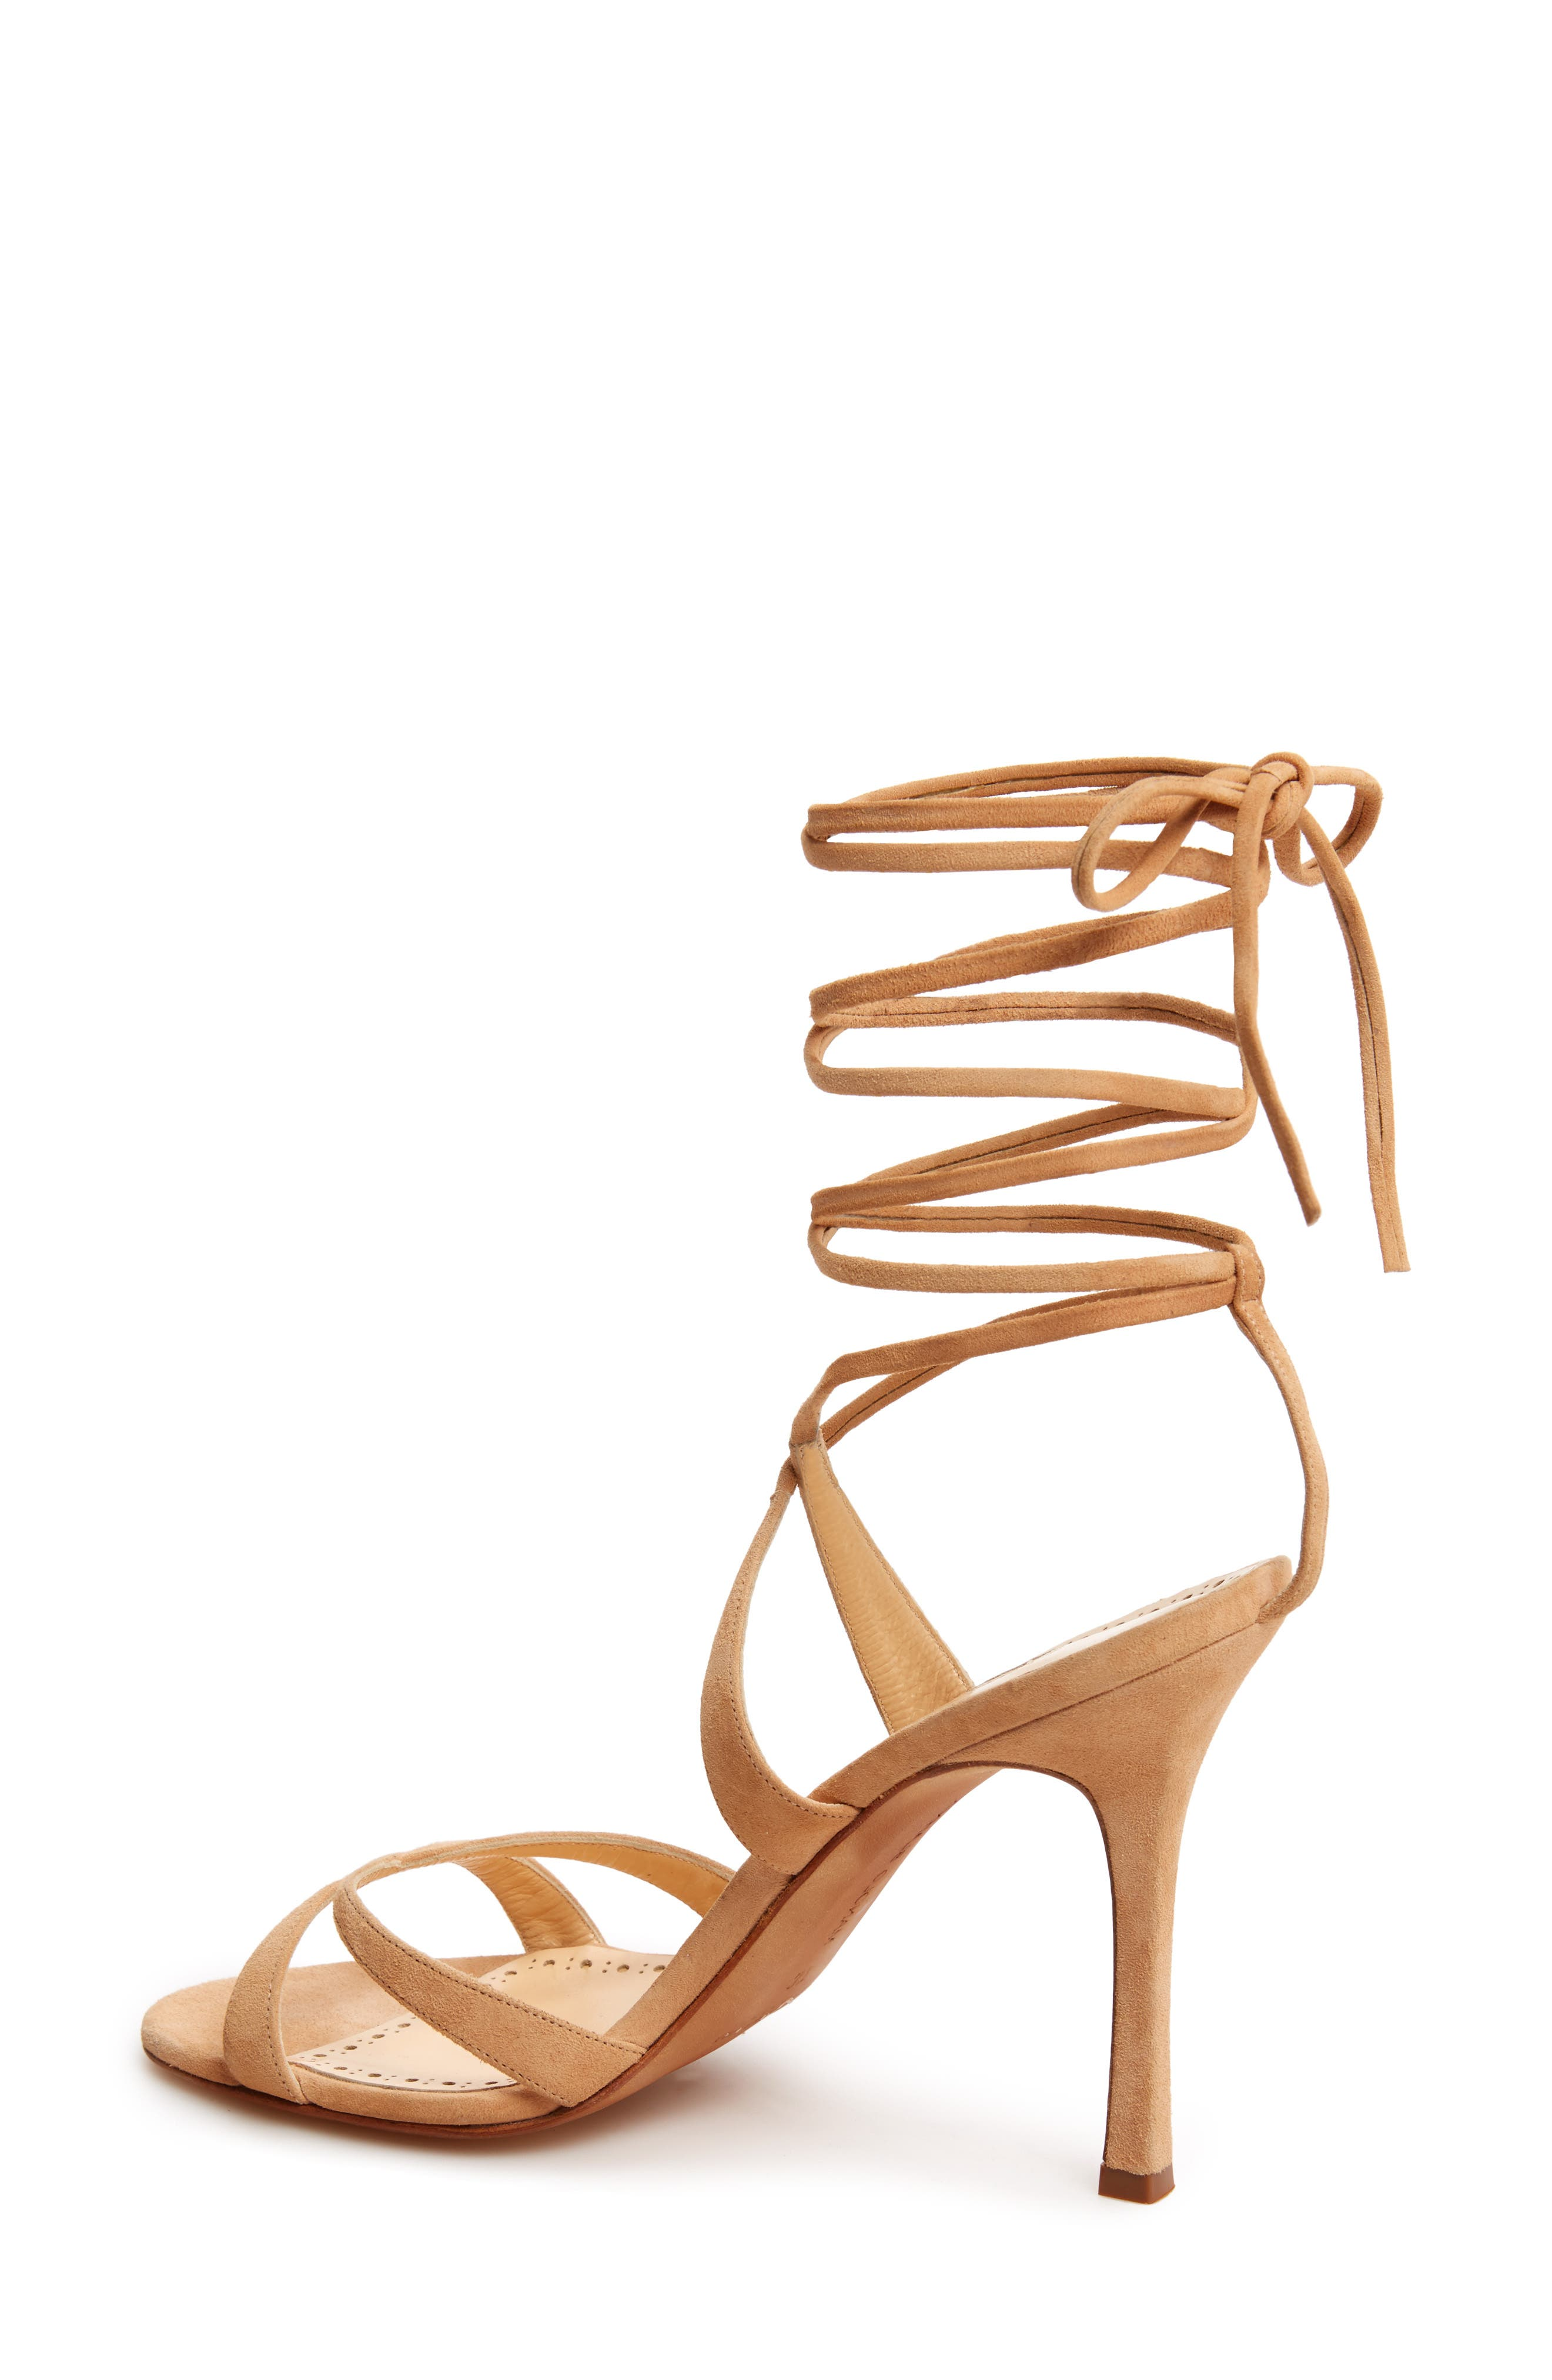 Criss Ankle Tie Sandal,                             Alternate thumbnail 2, color,                             Light Camel